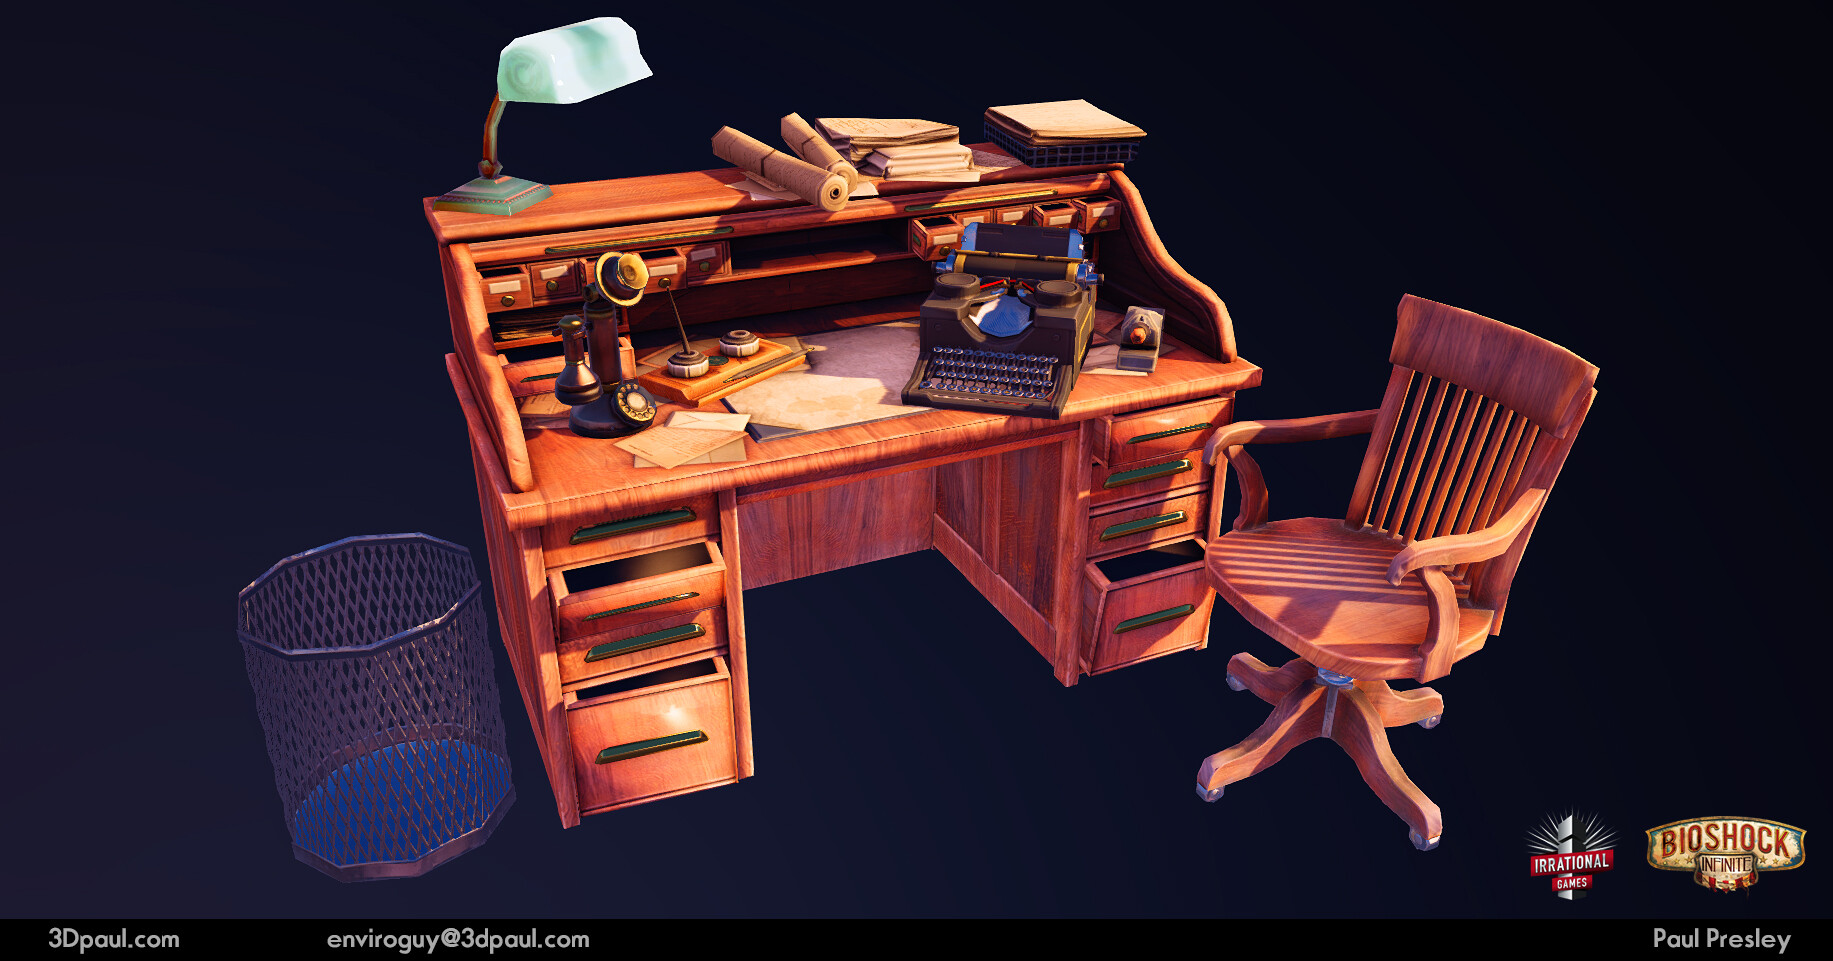 Paul presley 31 desk1